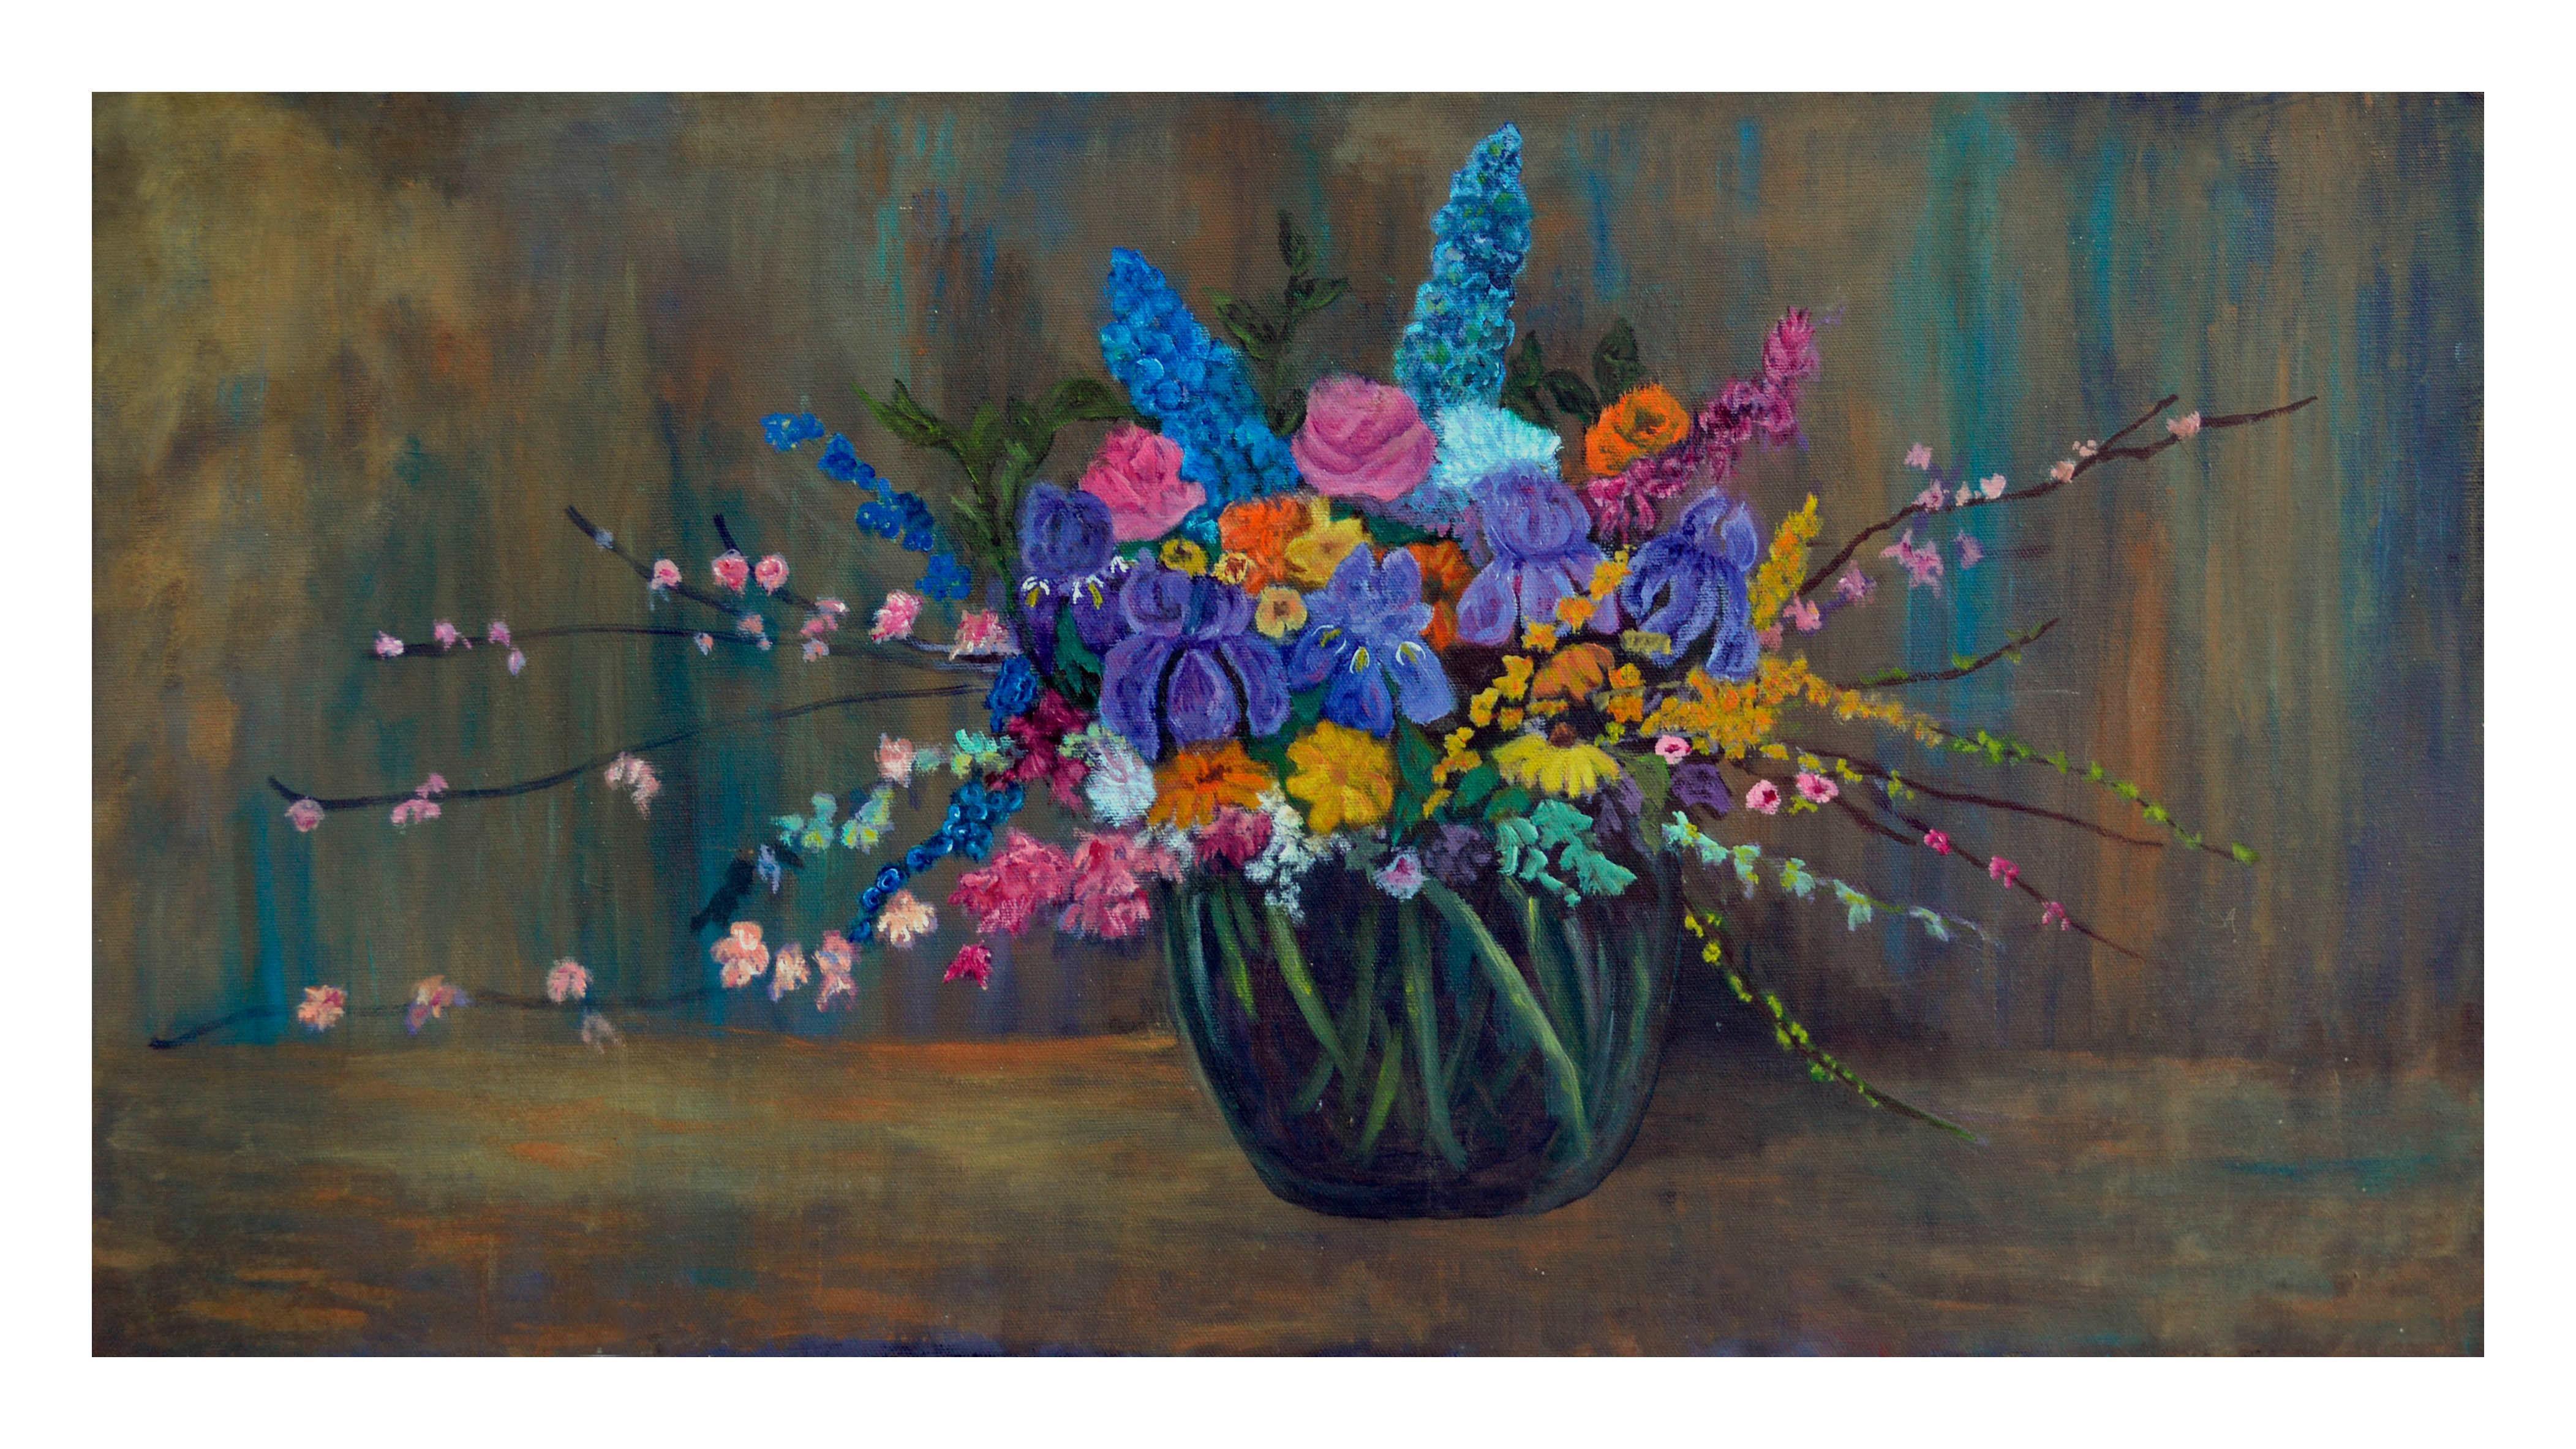 Spring Bouquet - Horizontal Floral Still Life